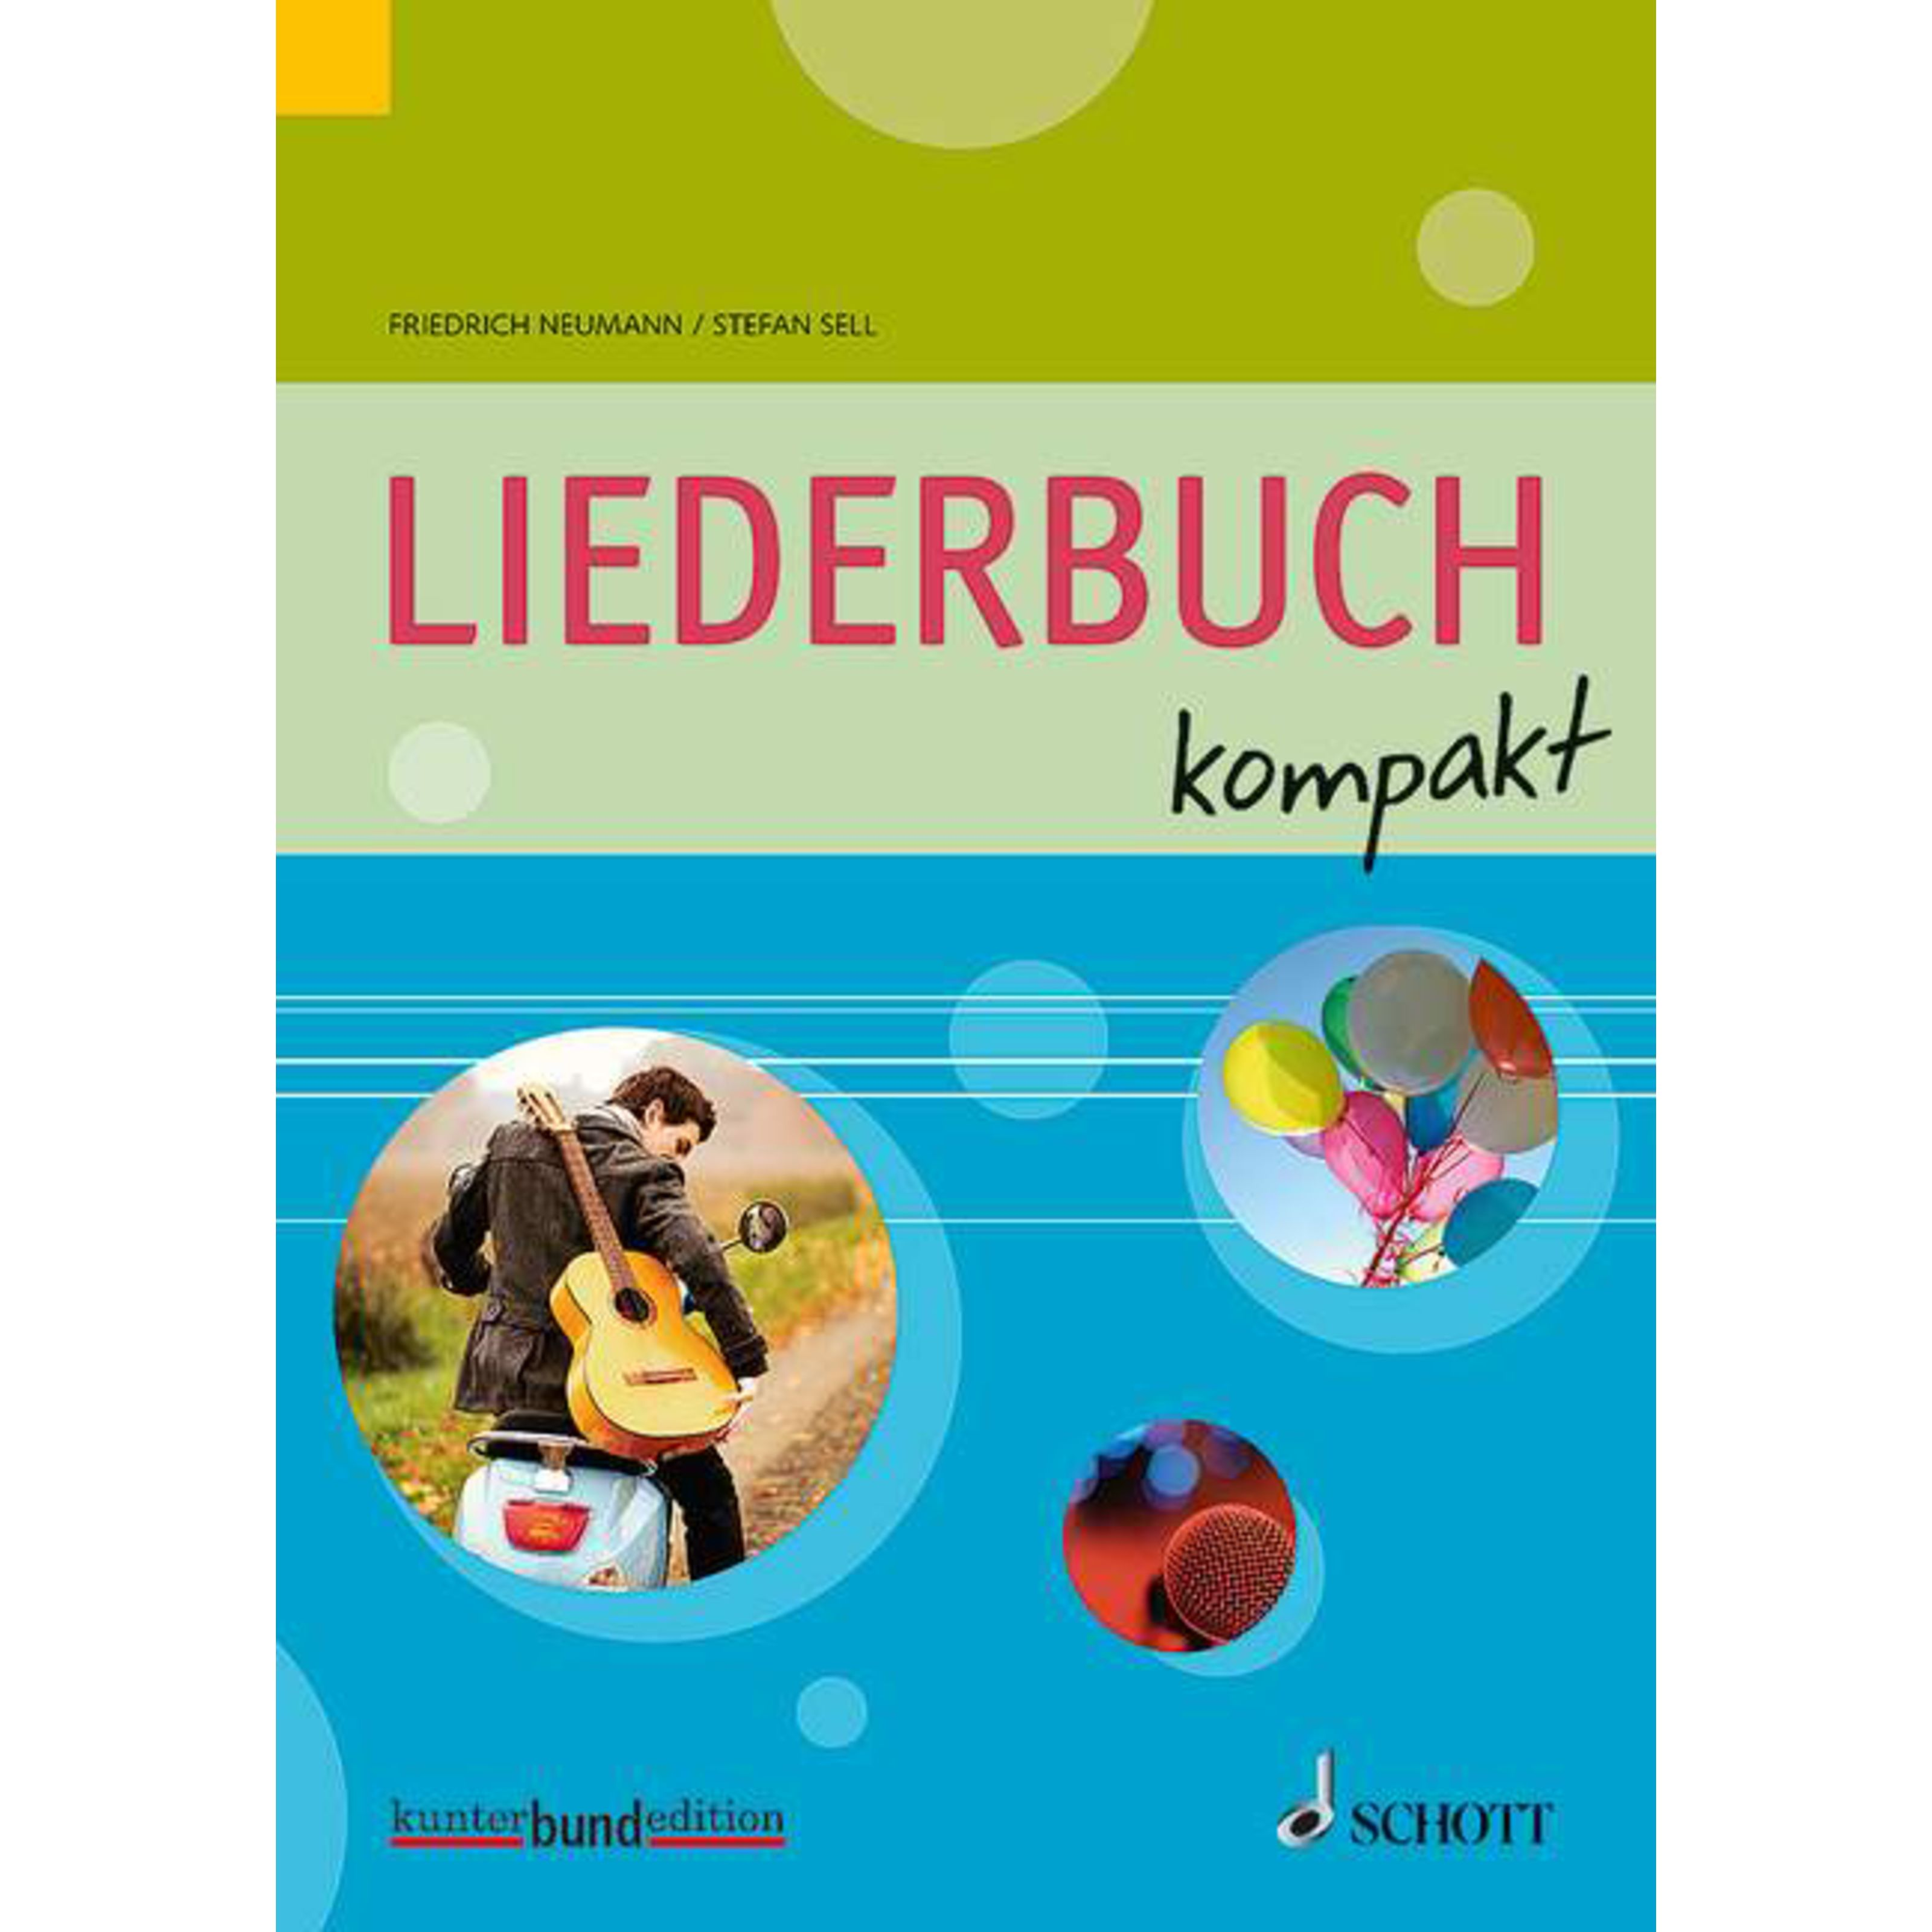 Stefan Sell Liederbuch kompakt BUND71172-9783795744854